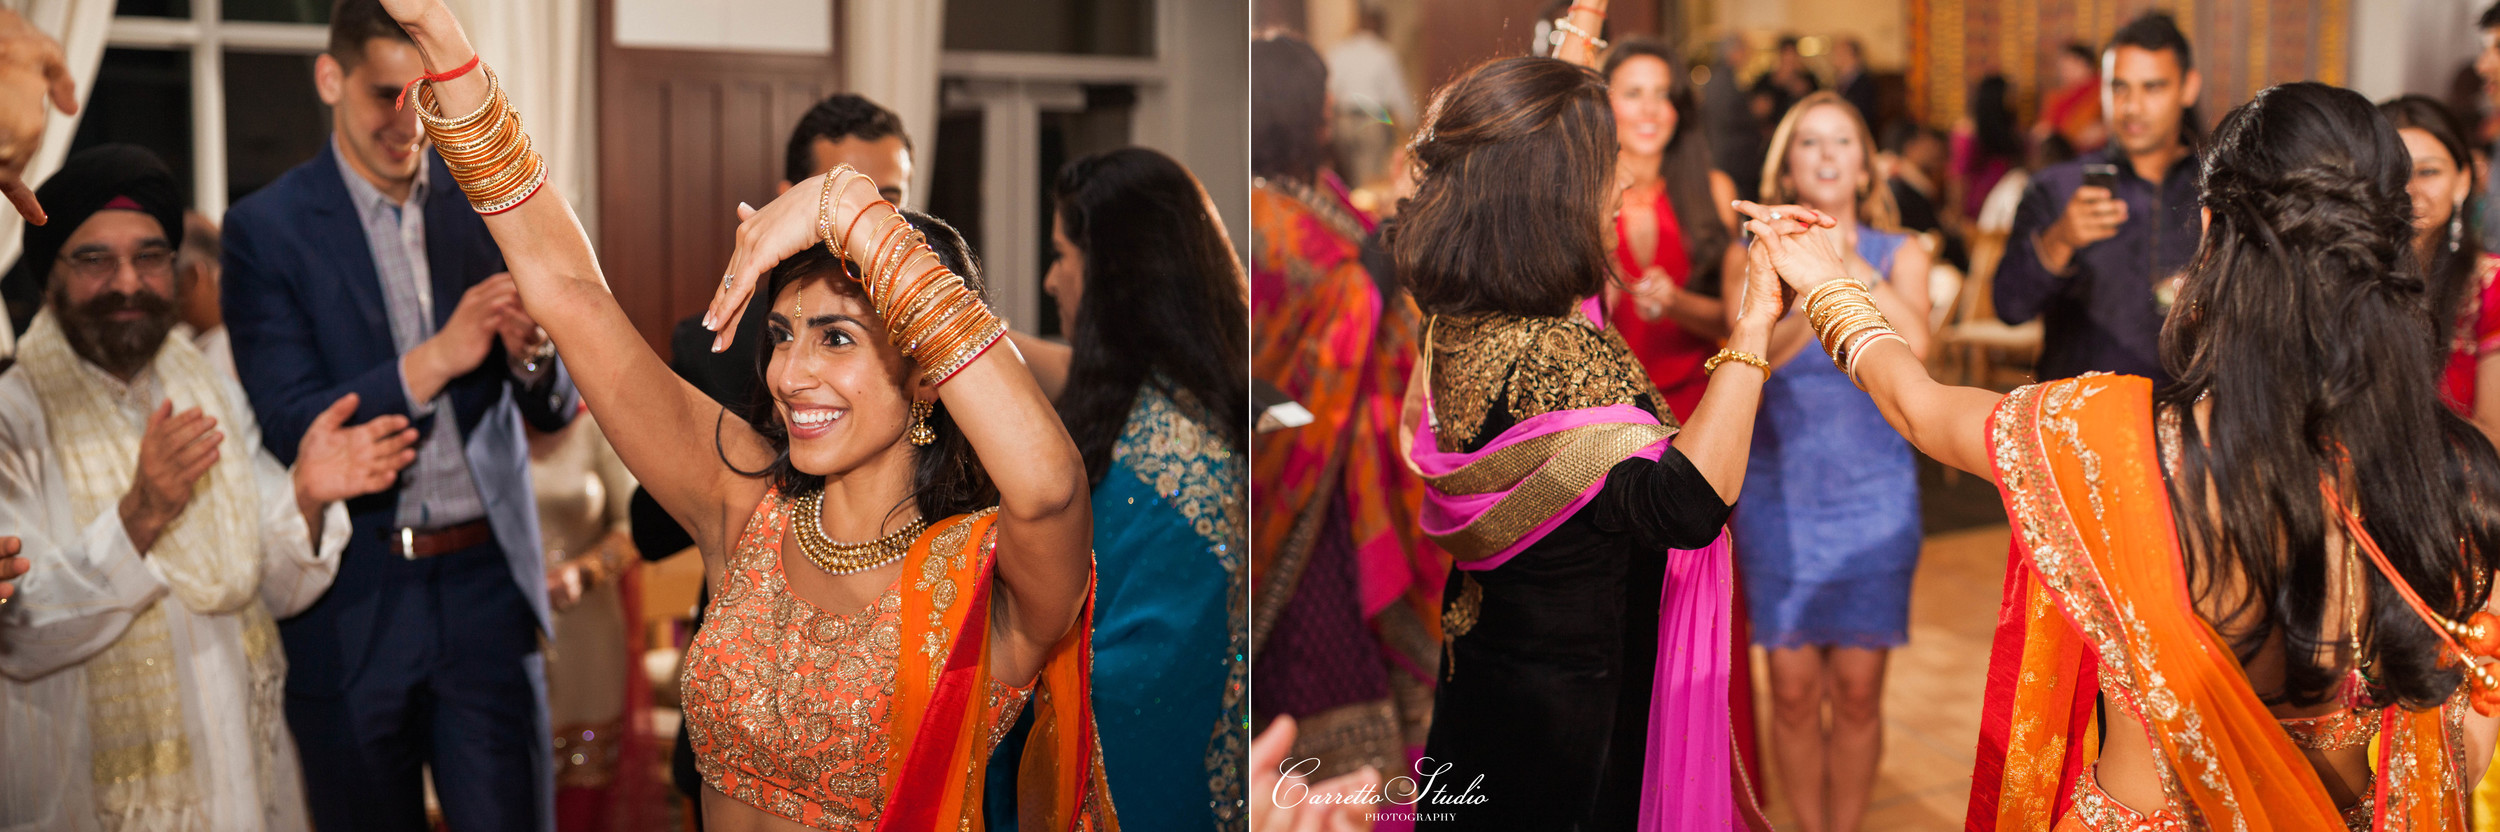 St Louis Wedding Photography-1051 copy.jpg